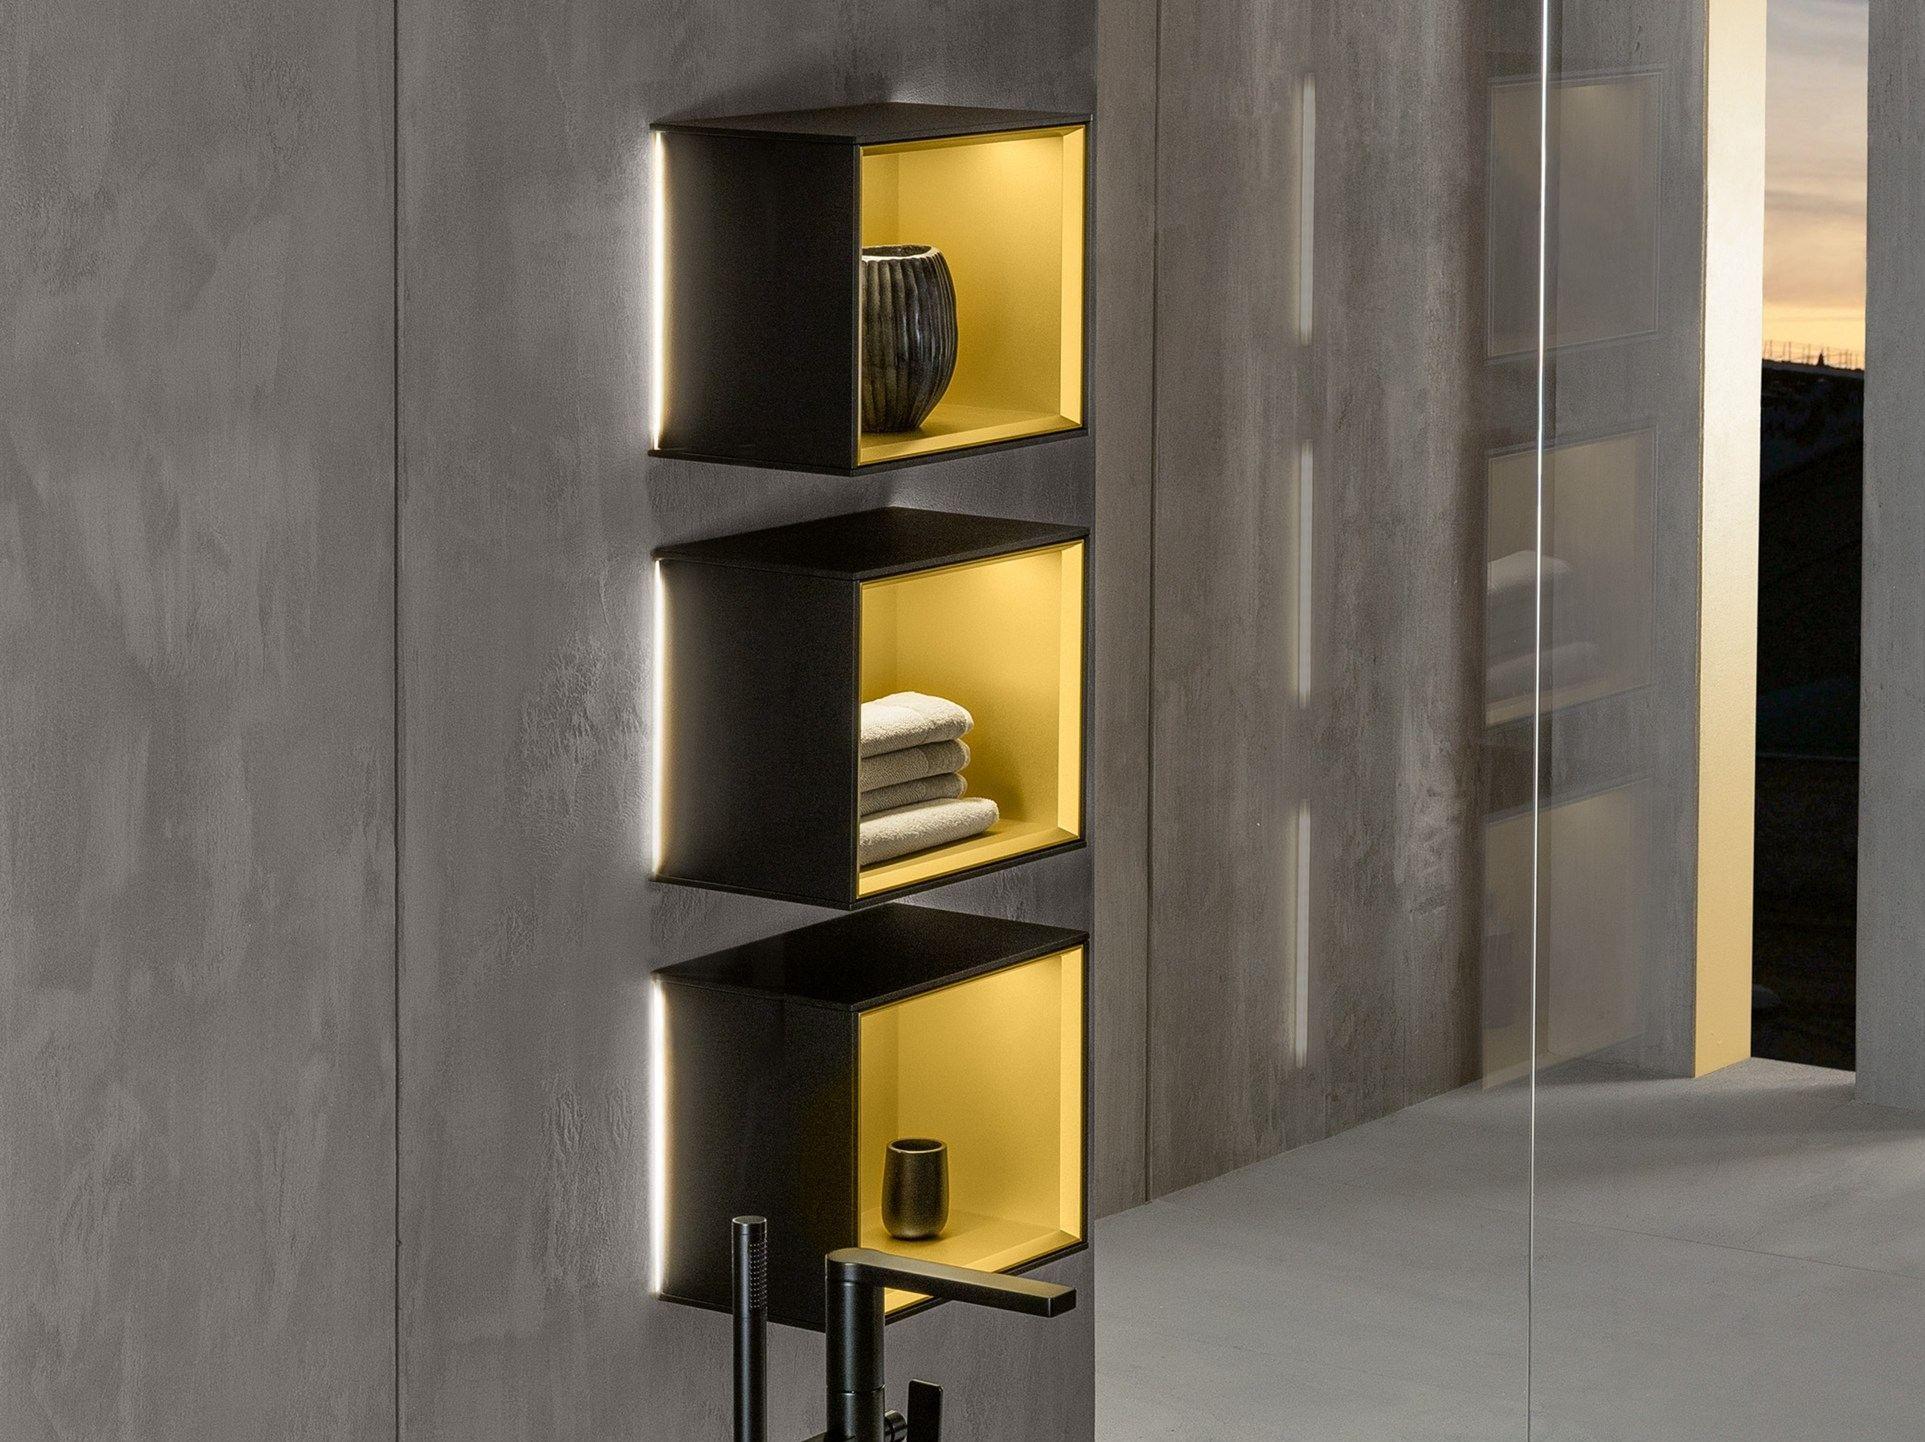 Villeroy and boch bathroom cabinets - Villeroy And Boch Bathroom Cabinets 61